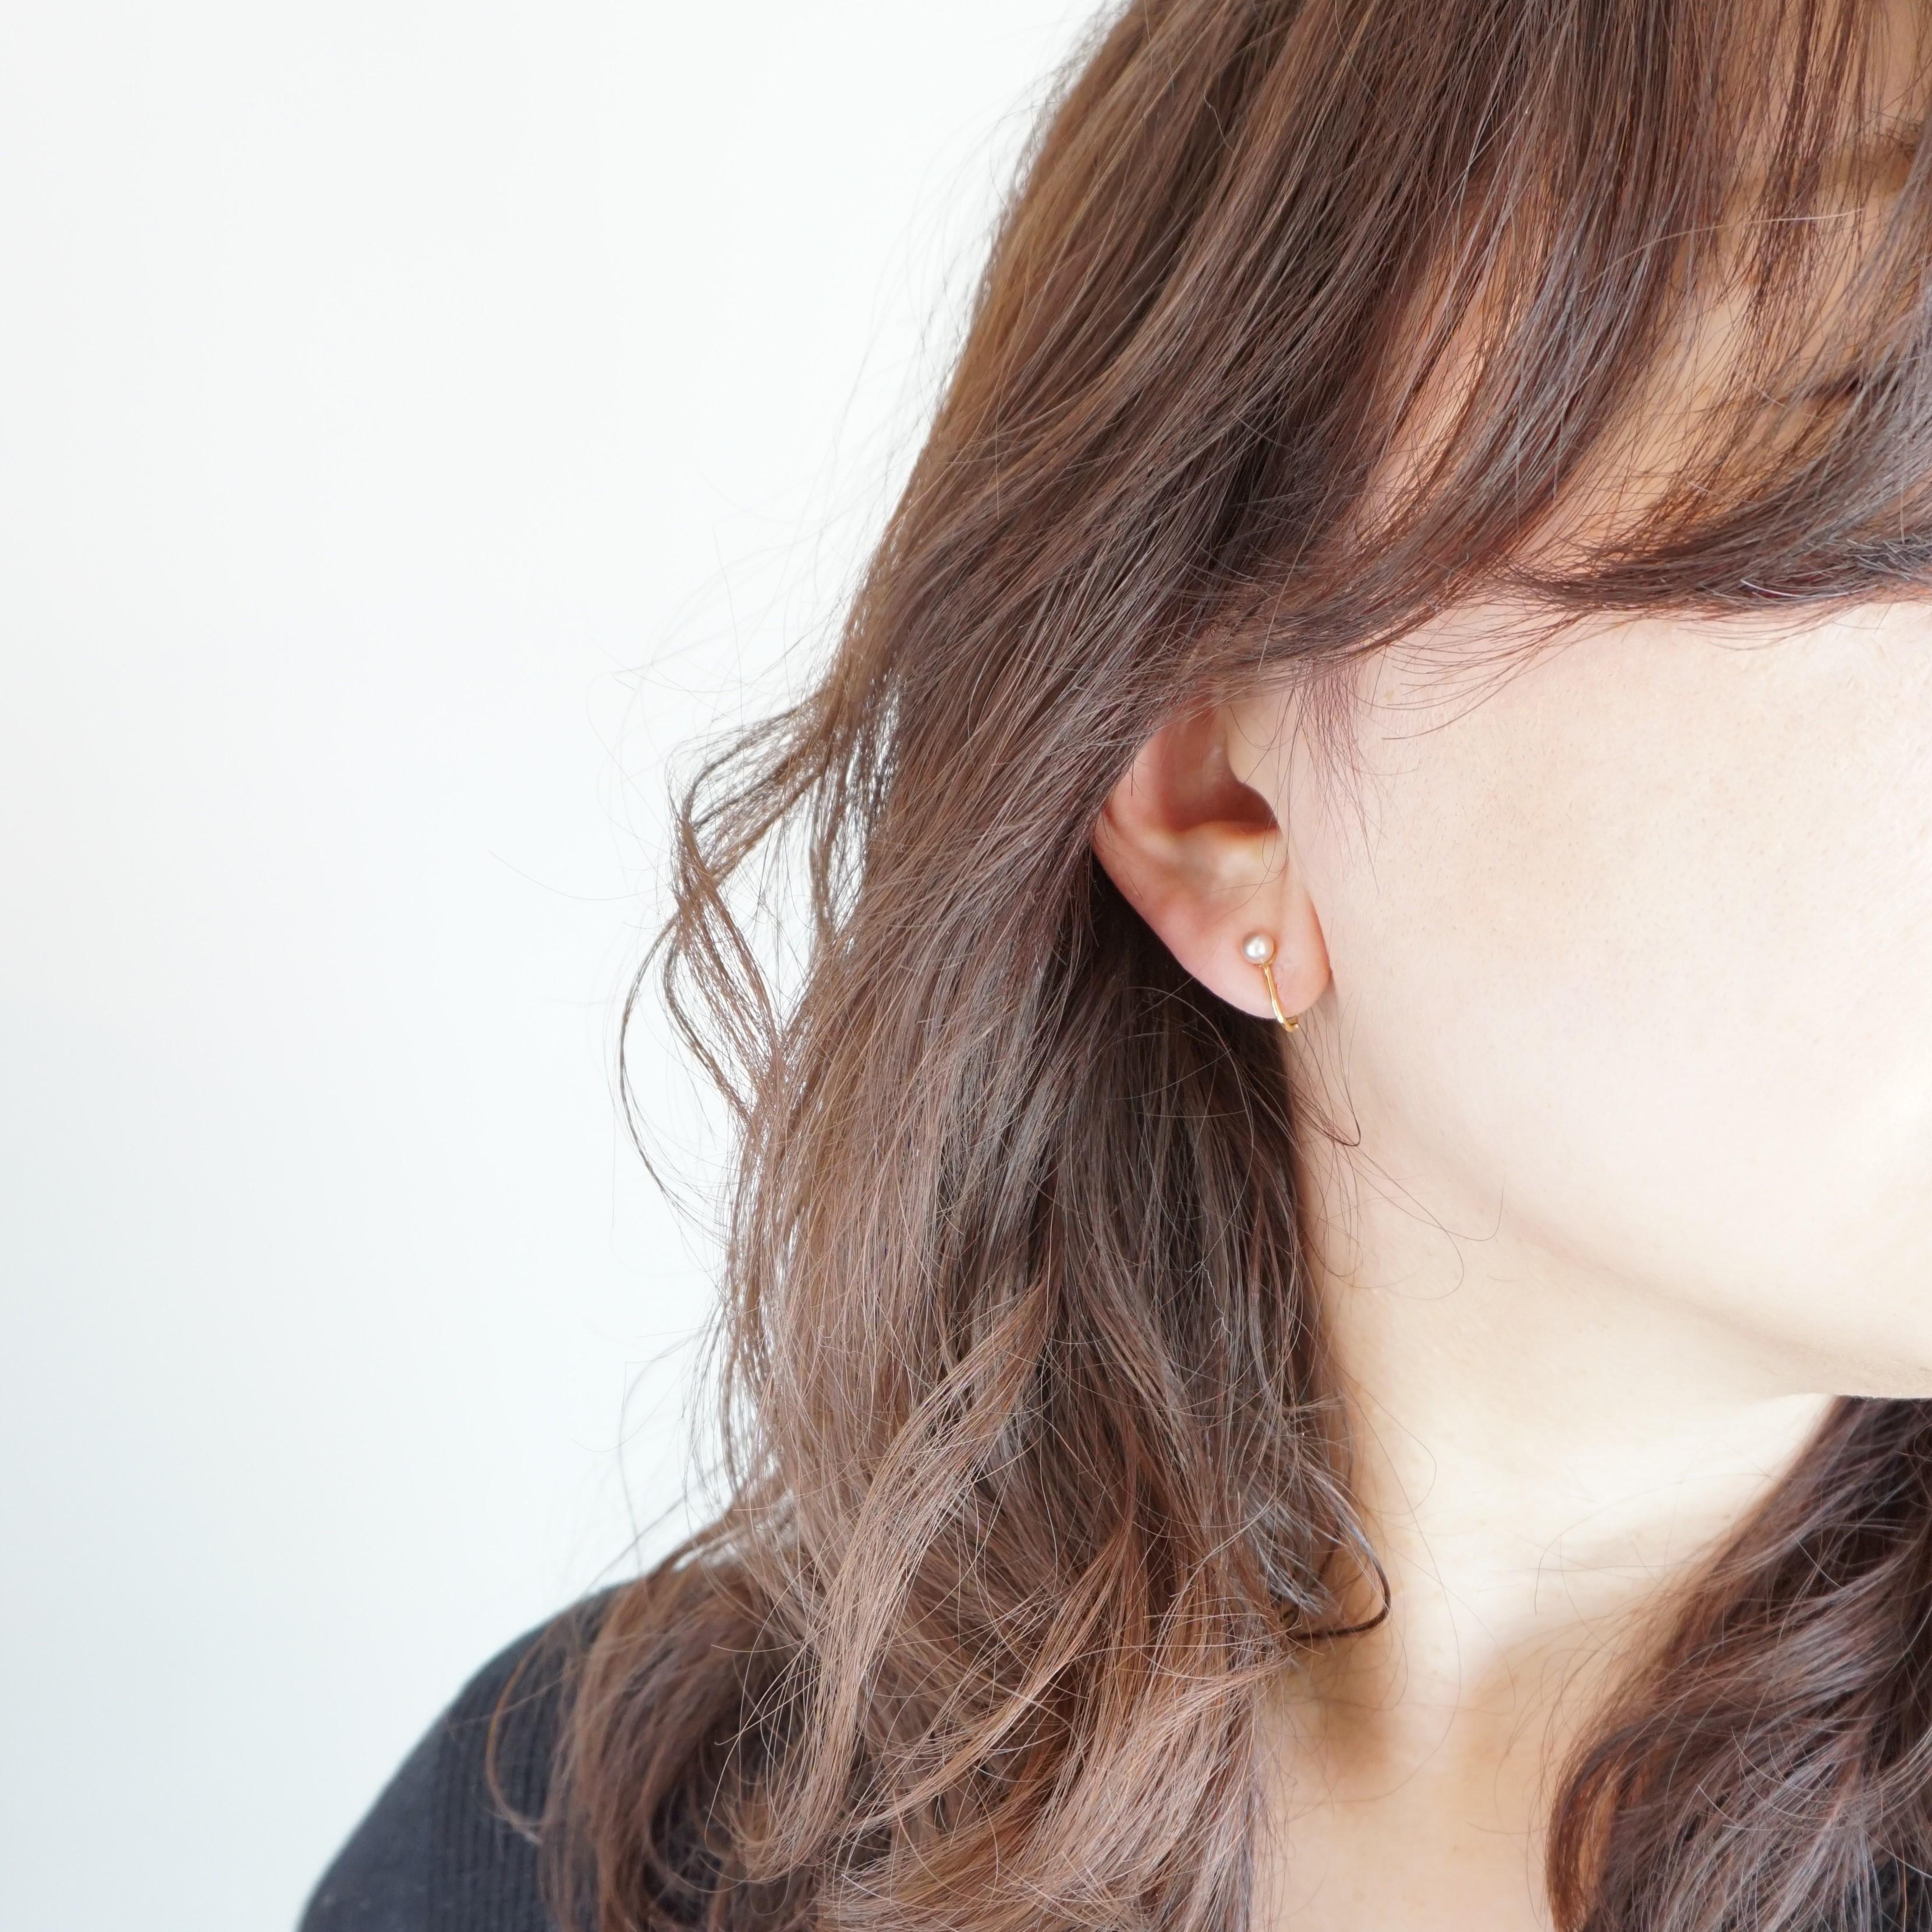 14kgf*Freshwater Pearls earring R-PK